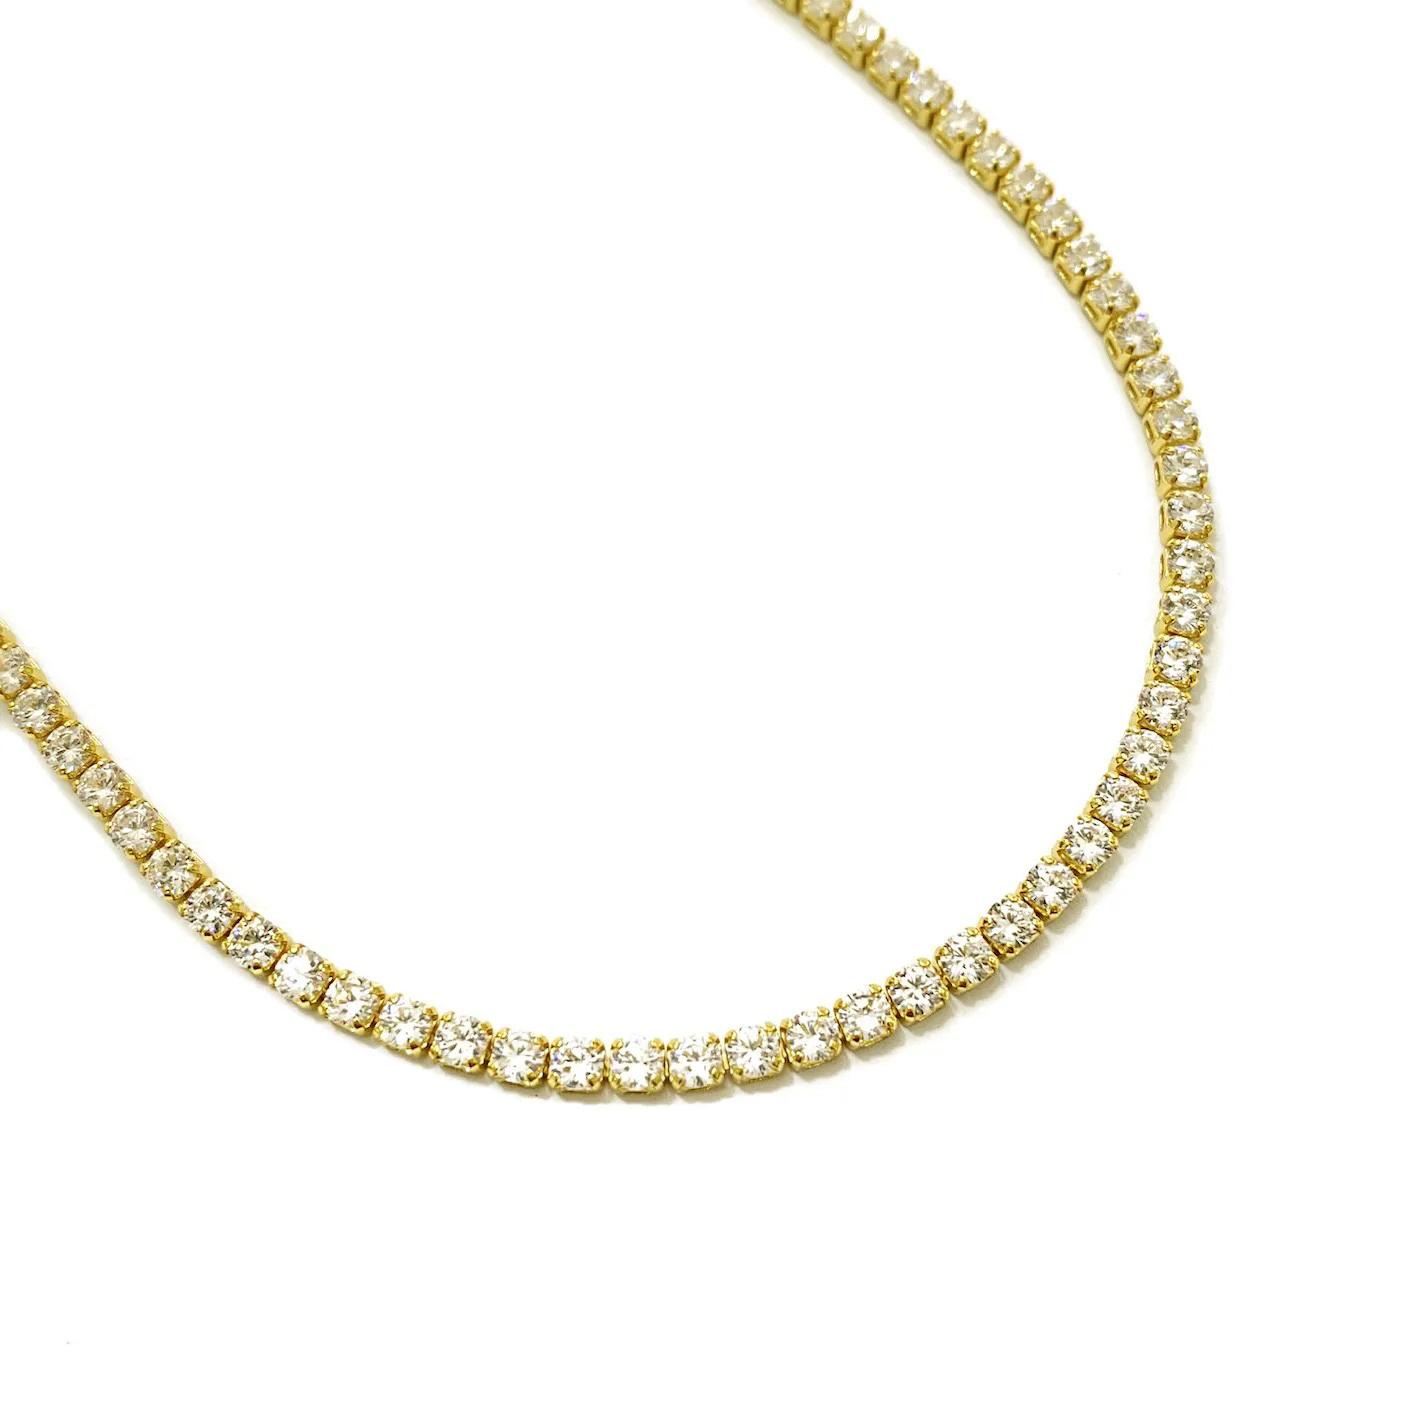 Corrente Riviera Tennis Chain 70cm 3mm 20g (Pedra Zircônia) (Banho Ouro 24k)